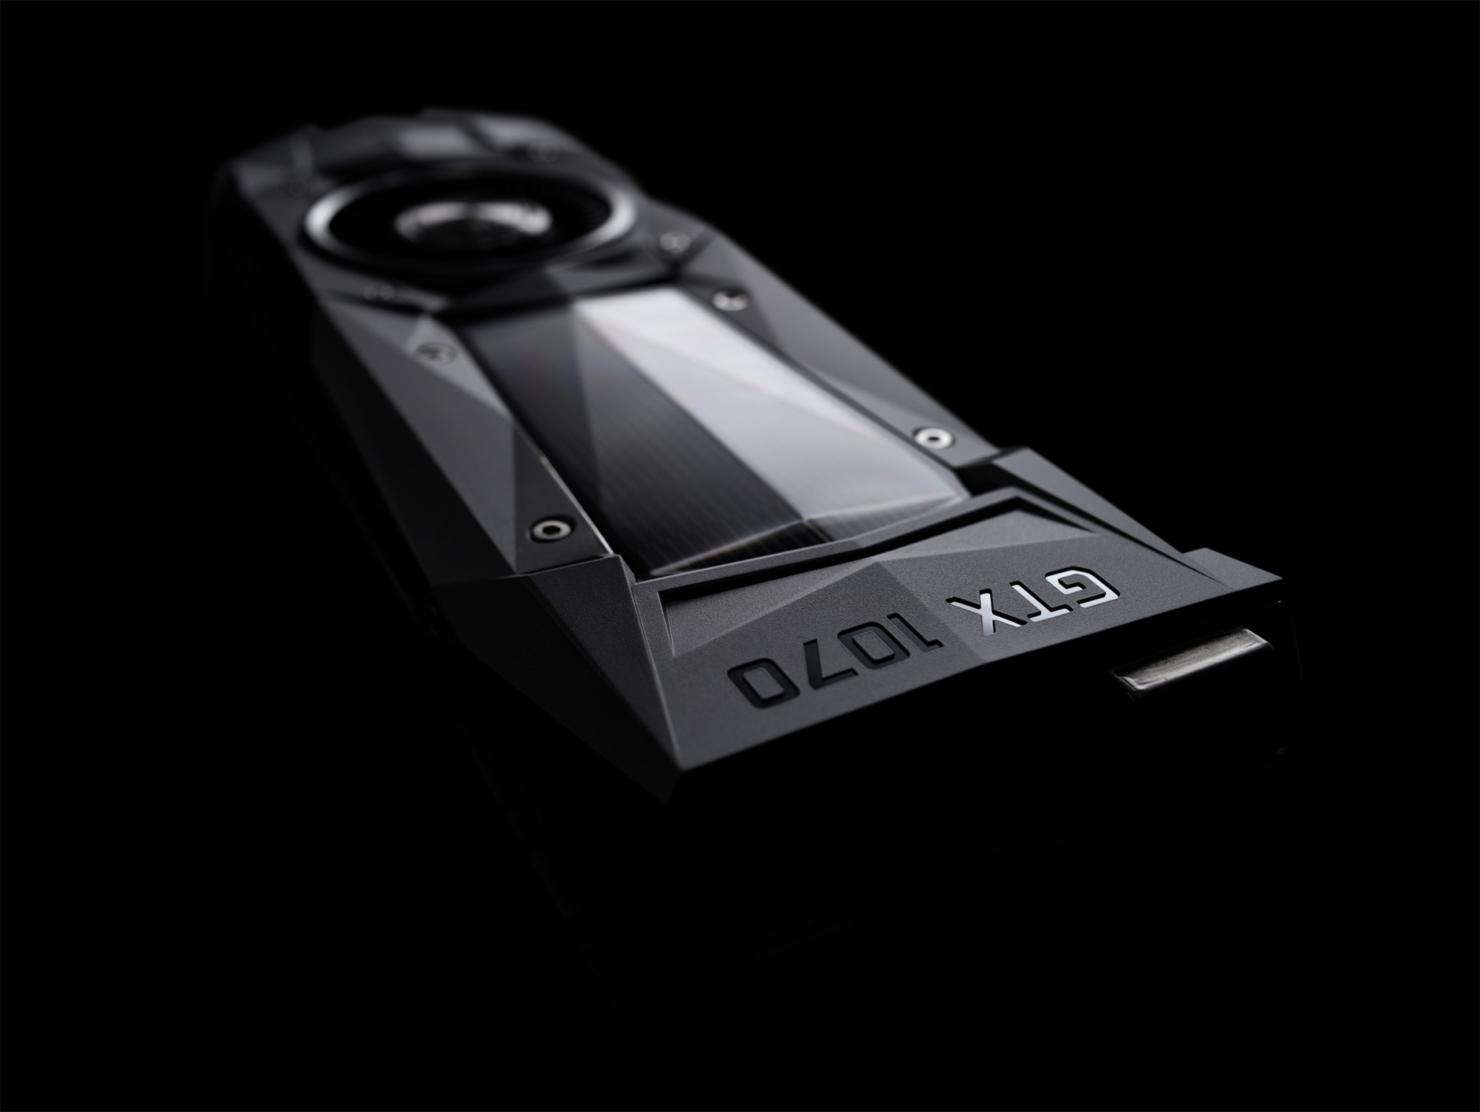 nvidia-geforce-gtx-1070-graphics-card_2